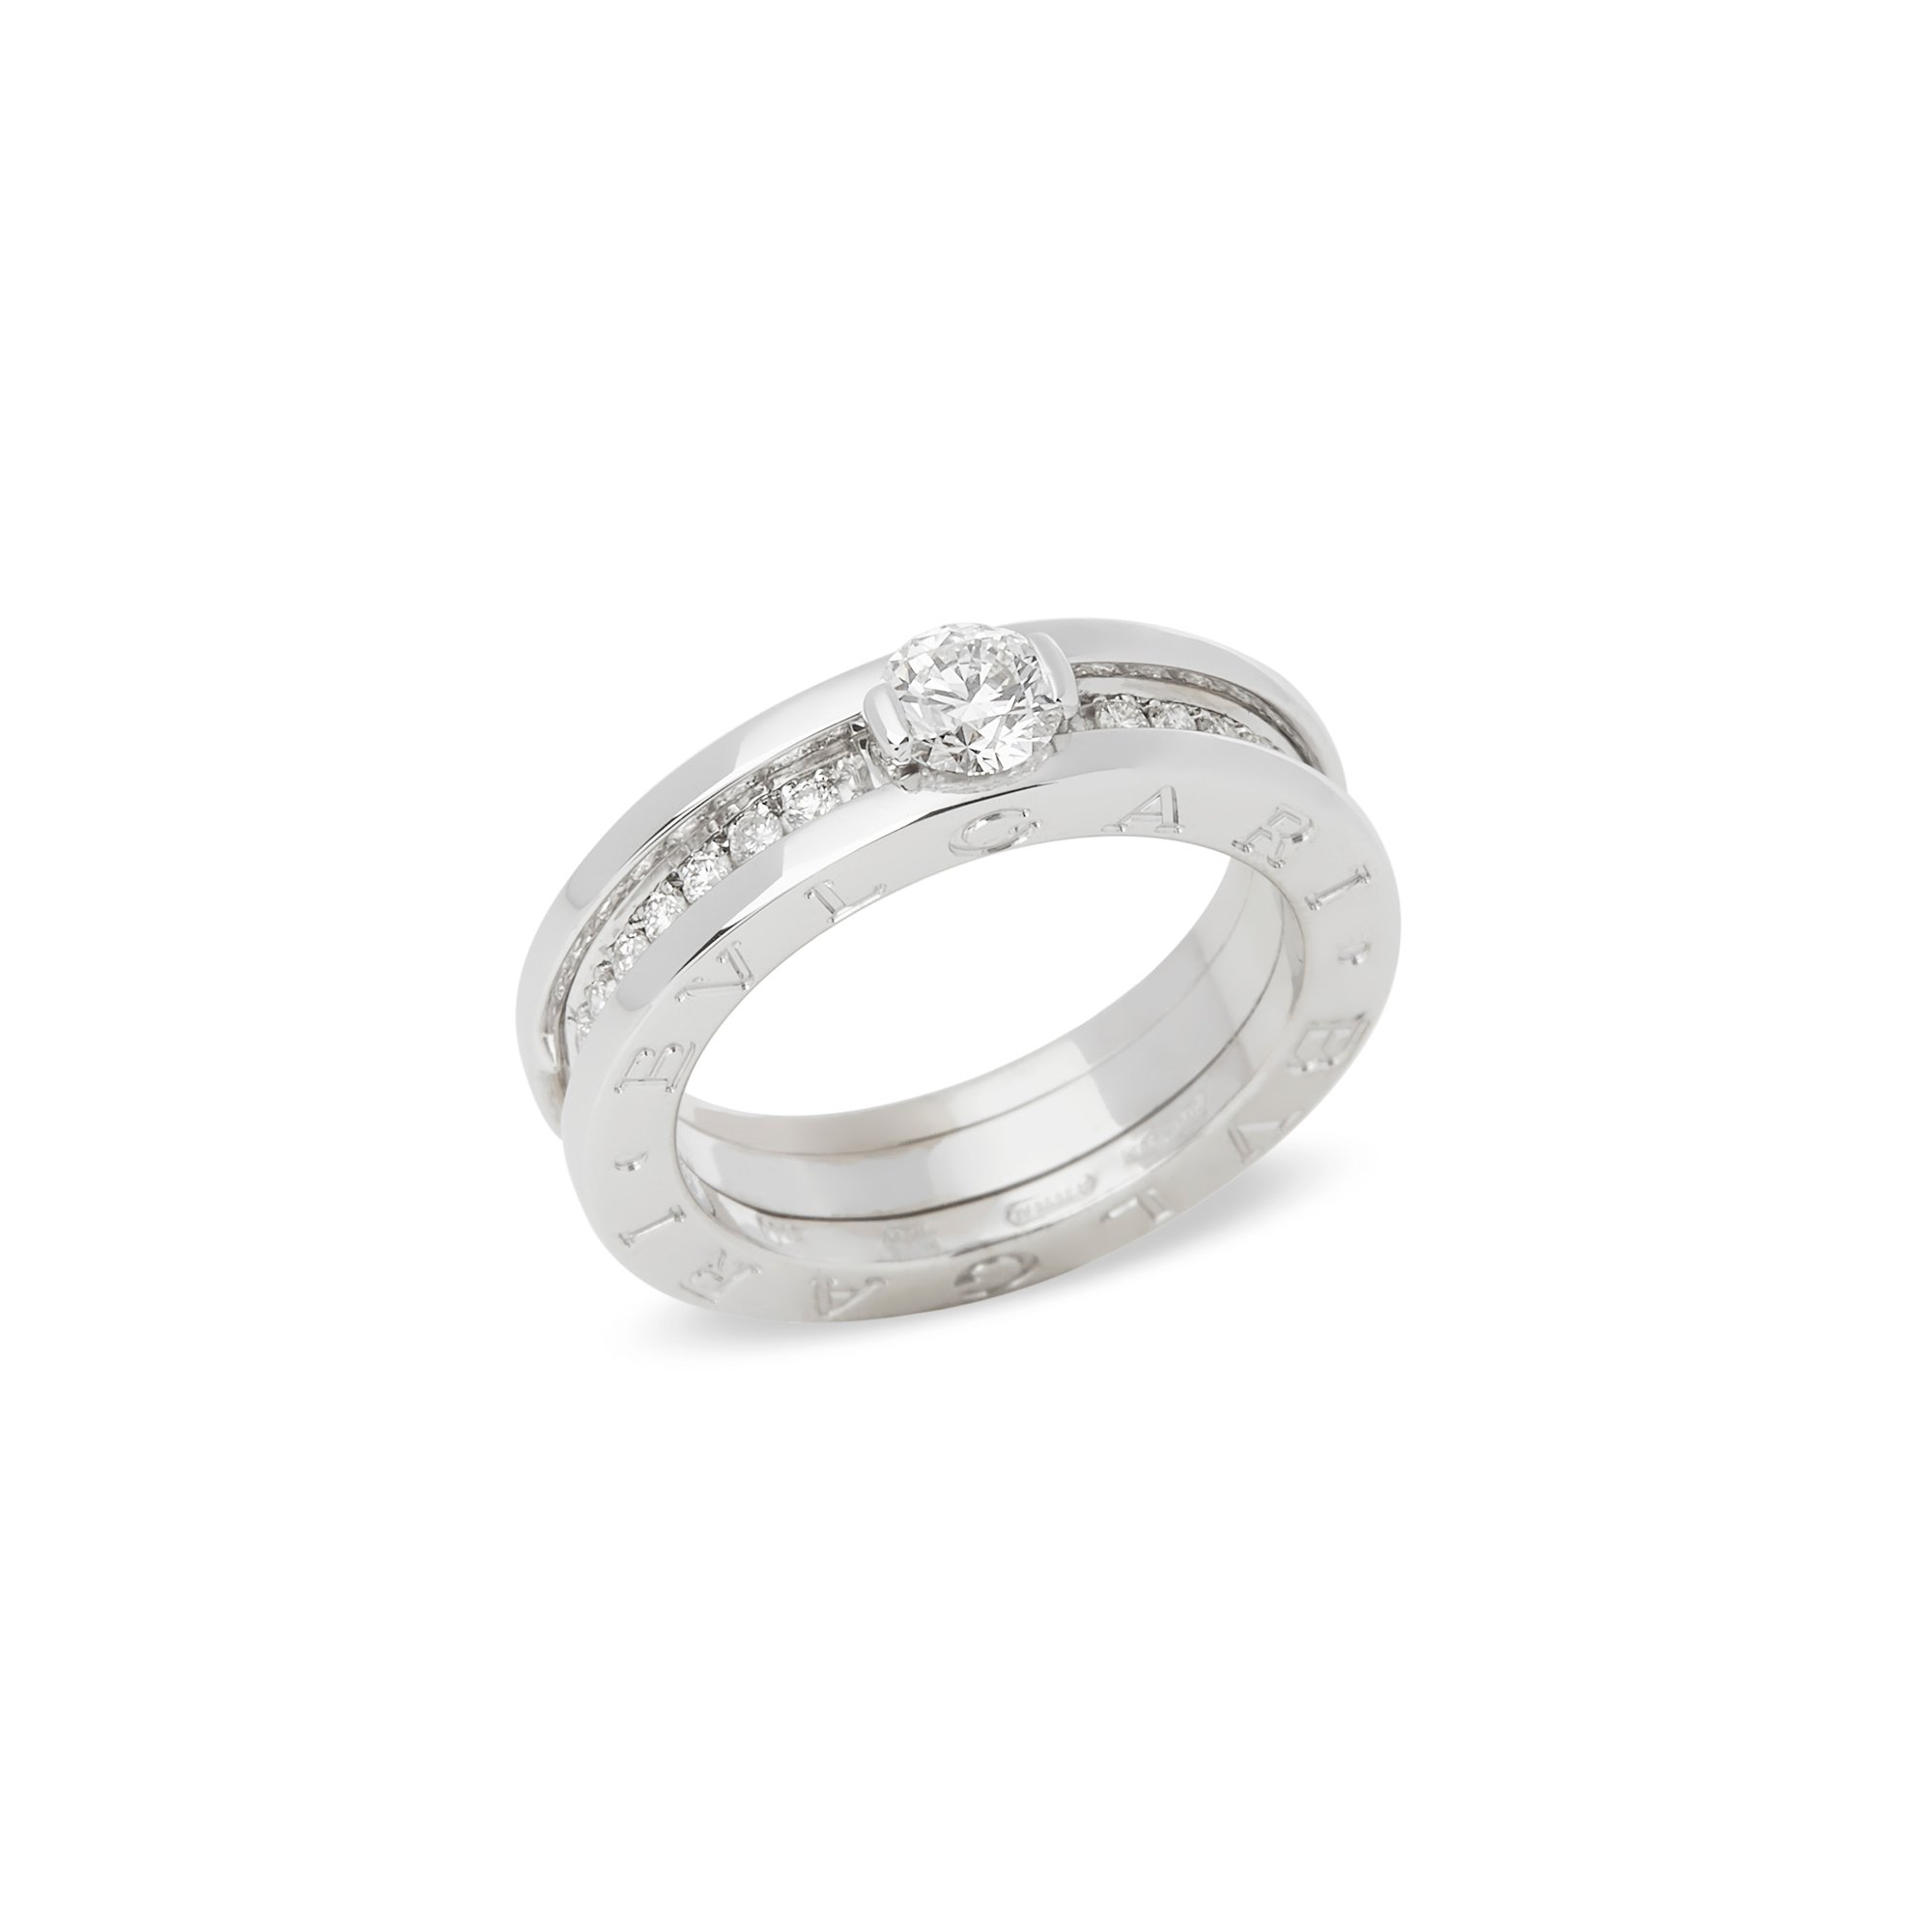 Bulgari 18k White Gold B Zero 1 Round Brilliant Cut Diamond Ring